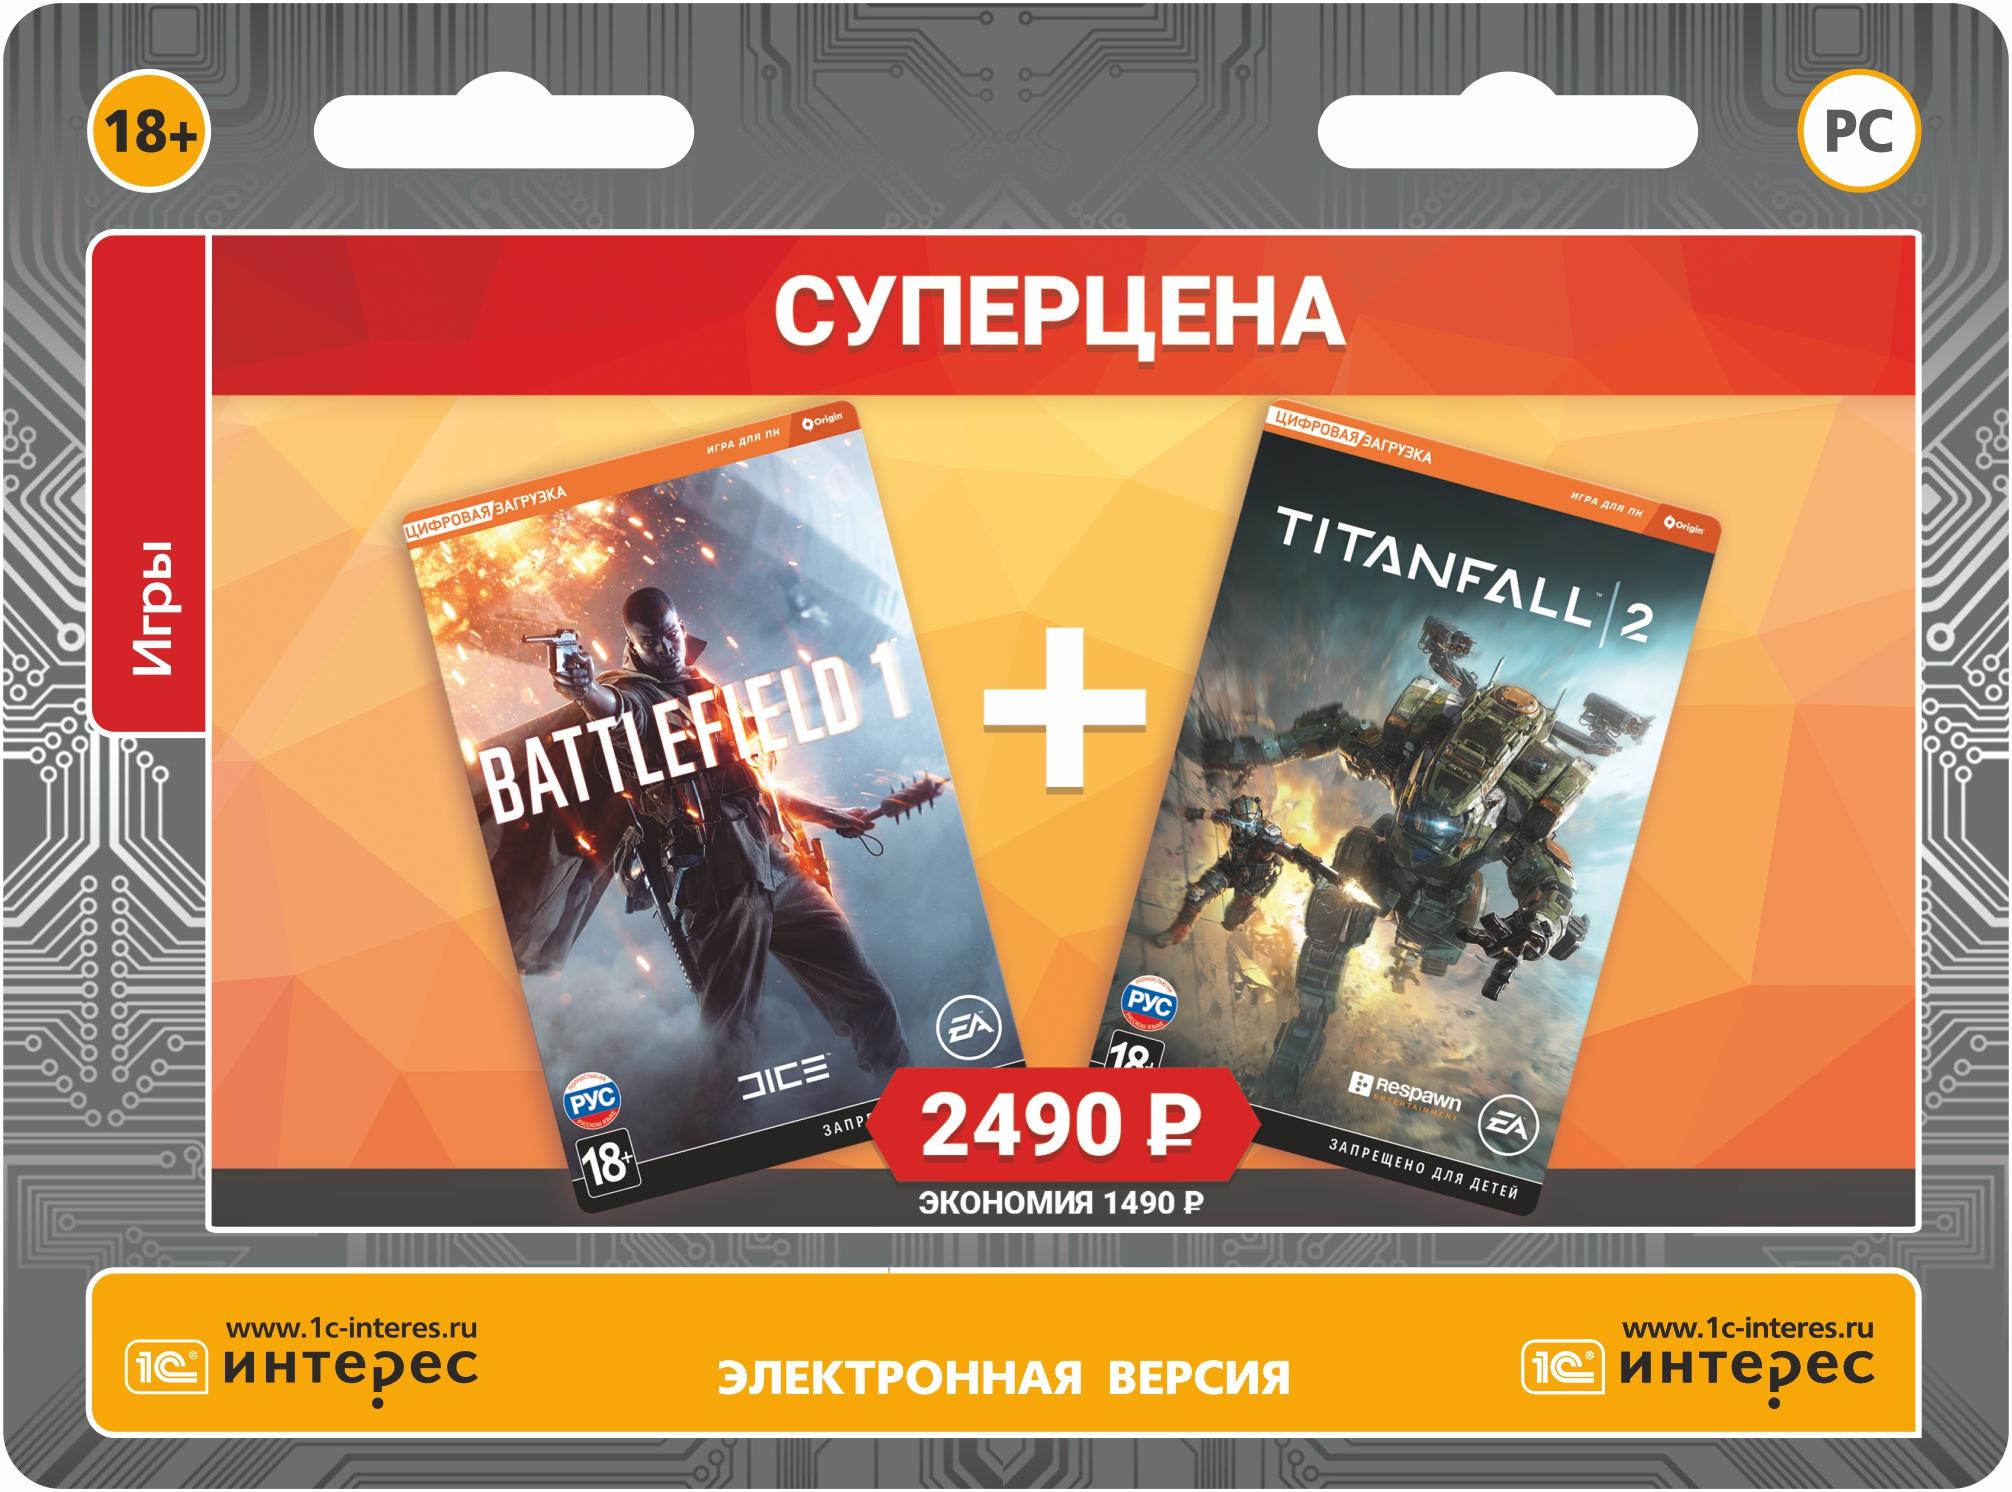 Battlefield 1 + Titanfall 2  (Цифровая версия)Battlefield 1 + Titanfall 2 &amp;ndash; cборник, включающий продолжения легендарной серии Battlefield и научно-фантастического шутера Titanfall.<br>